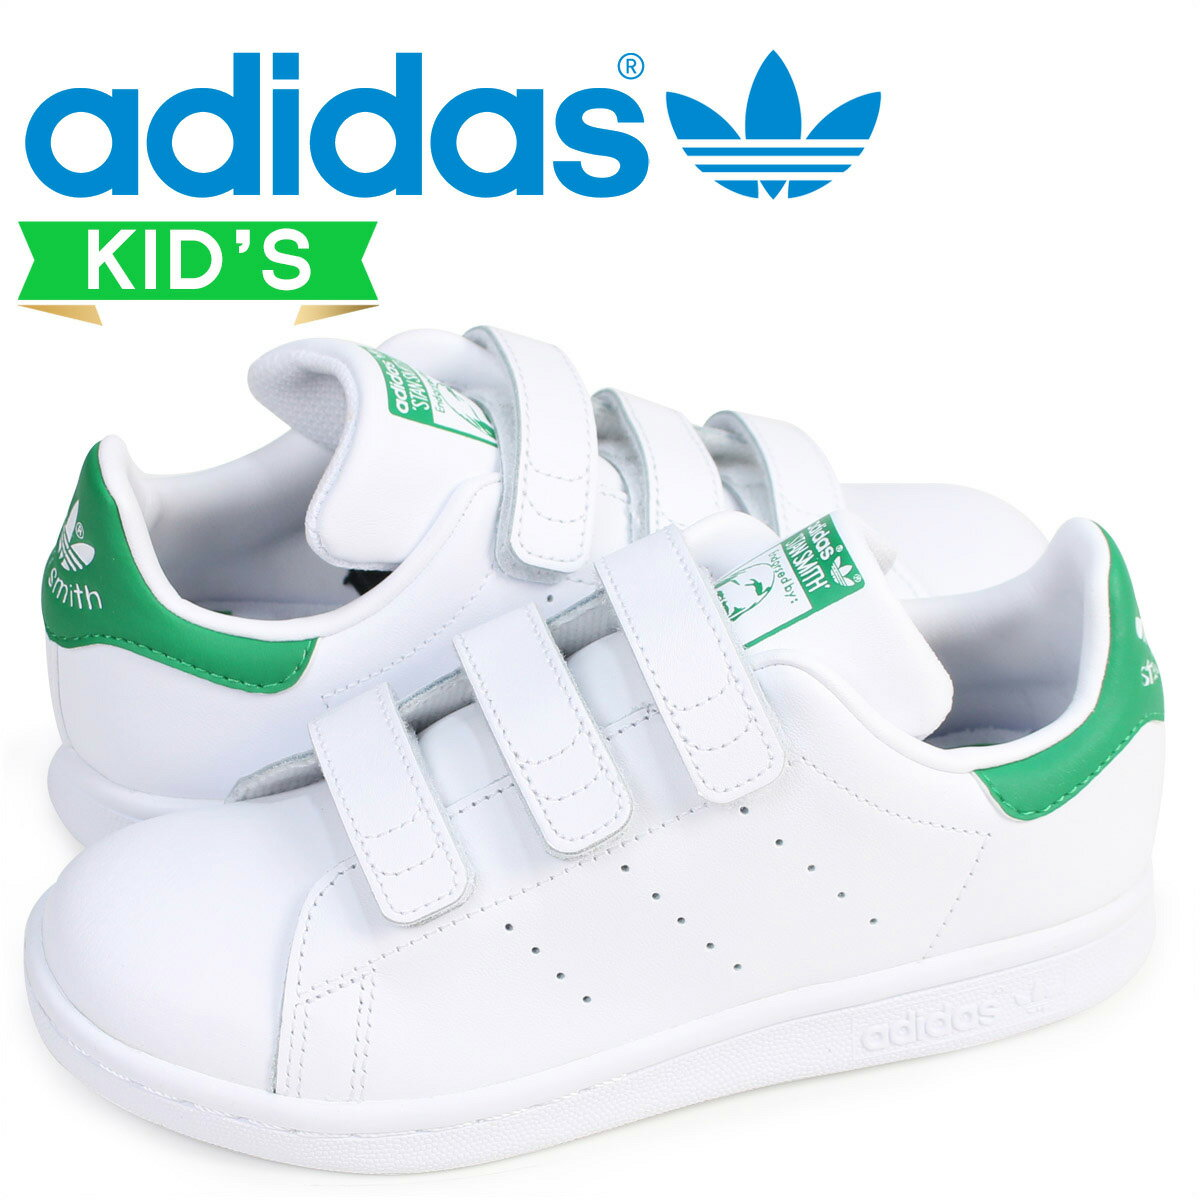 adidas Originals STAN SMITH CF C スタンスミス ベルクロ キッズ アディダス オリジナルス スニーカー M20607 靴 ホワイト [9/13 追加入荷]